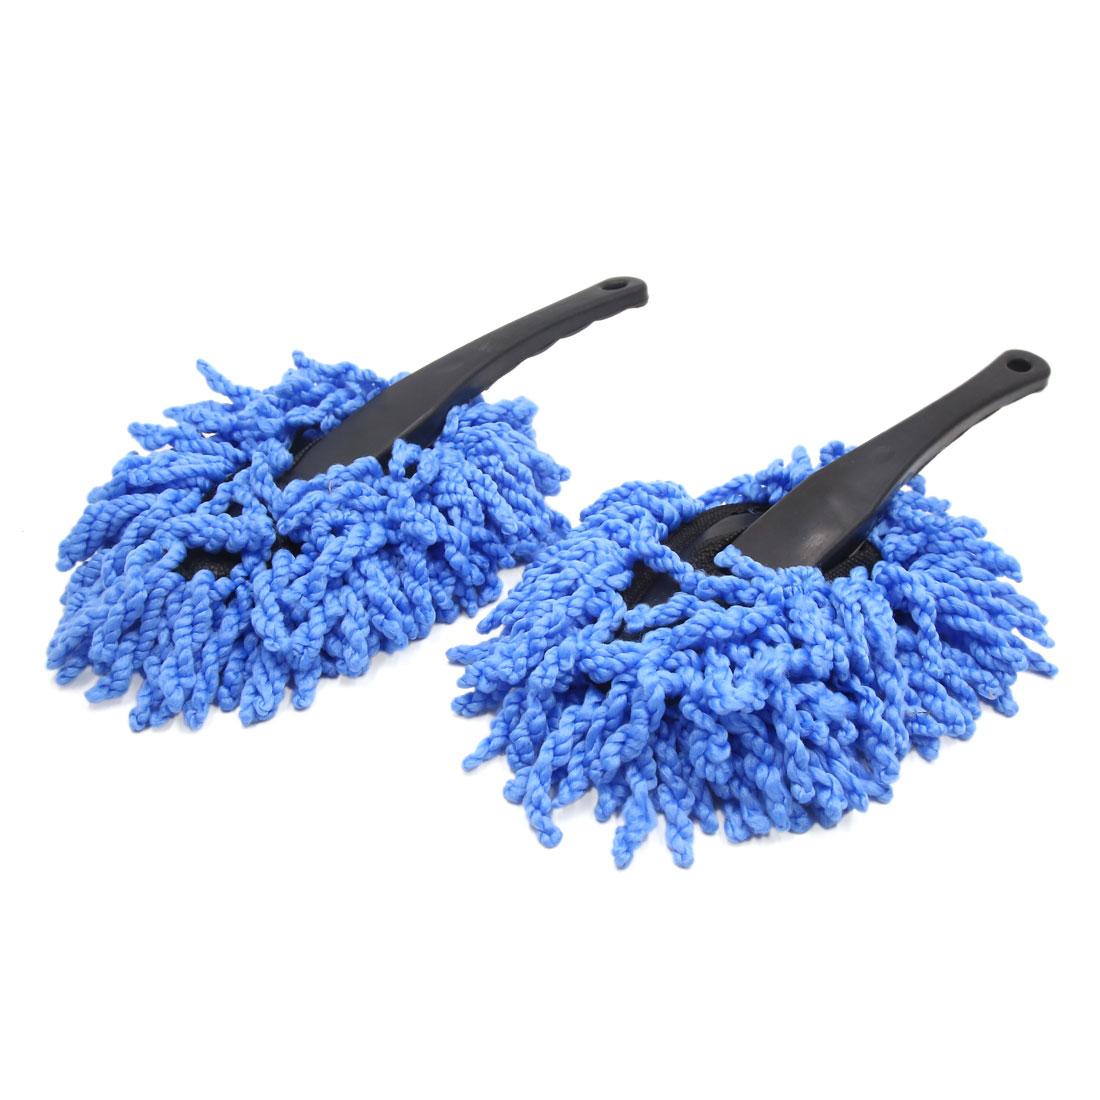 2pcs Blue Microfiber Automobile Car Wax Brush Mop Dirt Duster Cleaning Tool